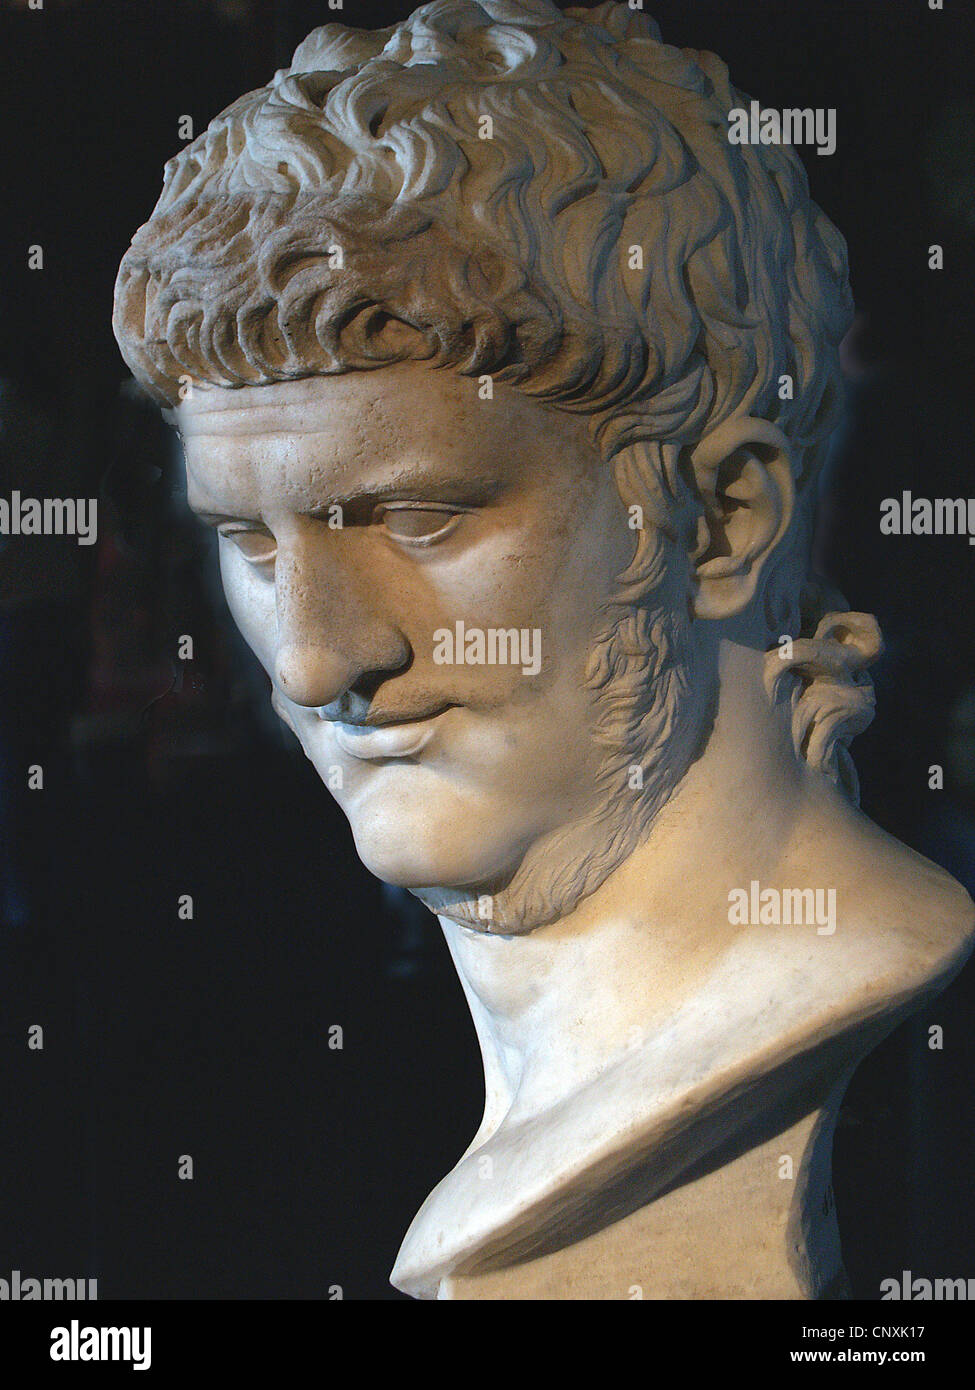 Bust of Emperor Nero in the Curia of Roman Forum,Rome - Stock Image